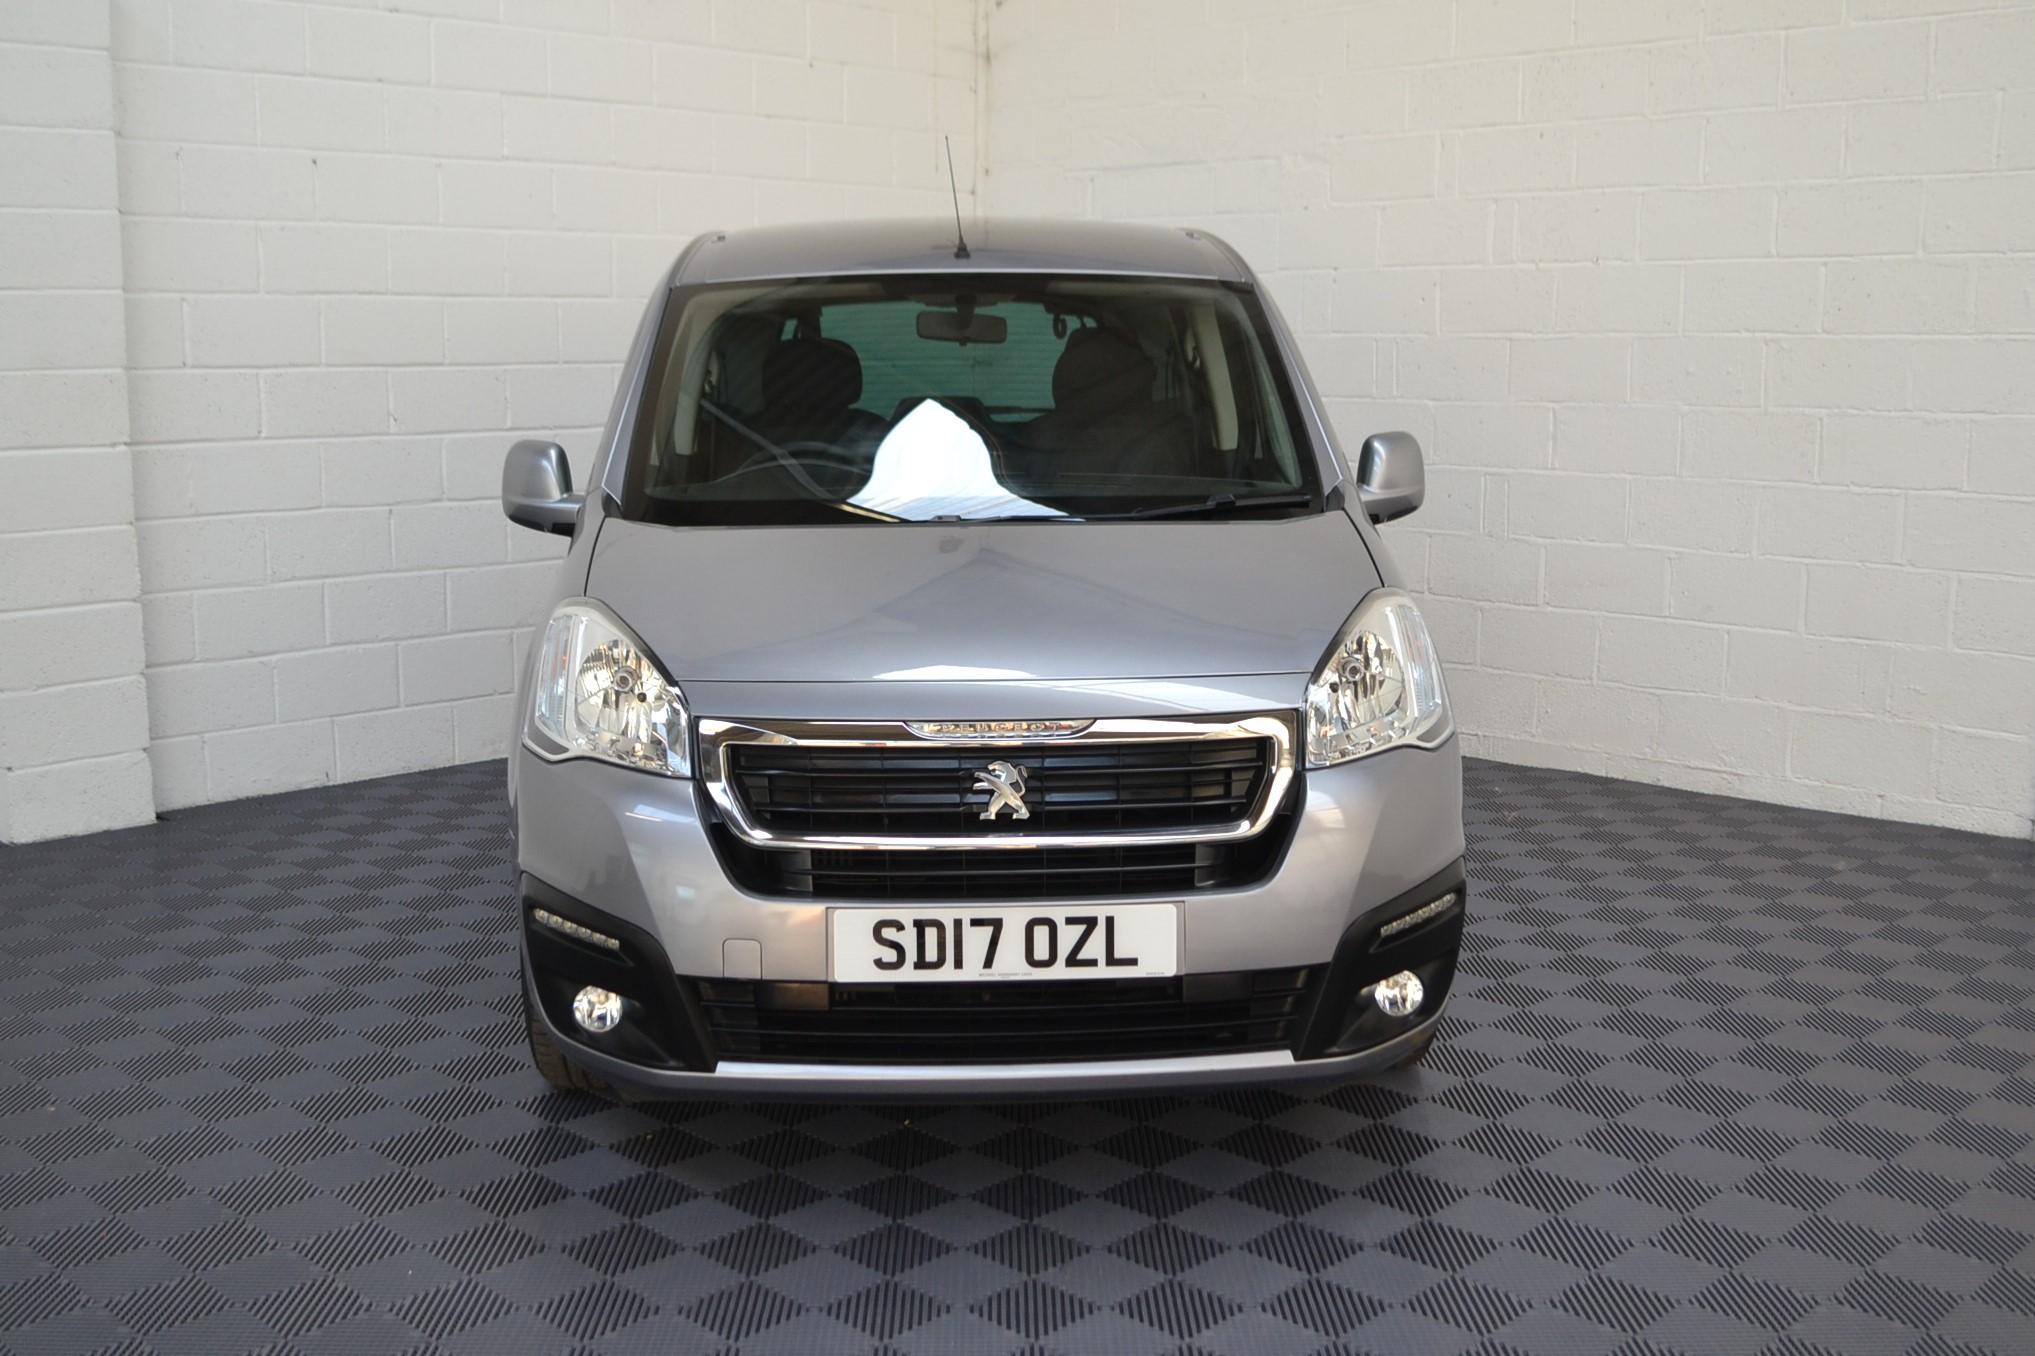 WAV Cars For Sale Bristol Wheelchair Accessible Vehicles Used For Sale Somerset Devon Dorset Bath Peugeot Partner SD17 OZL 20